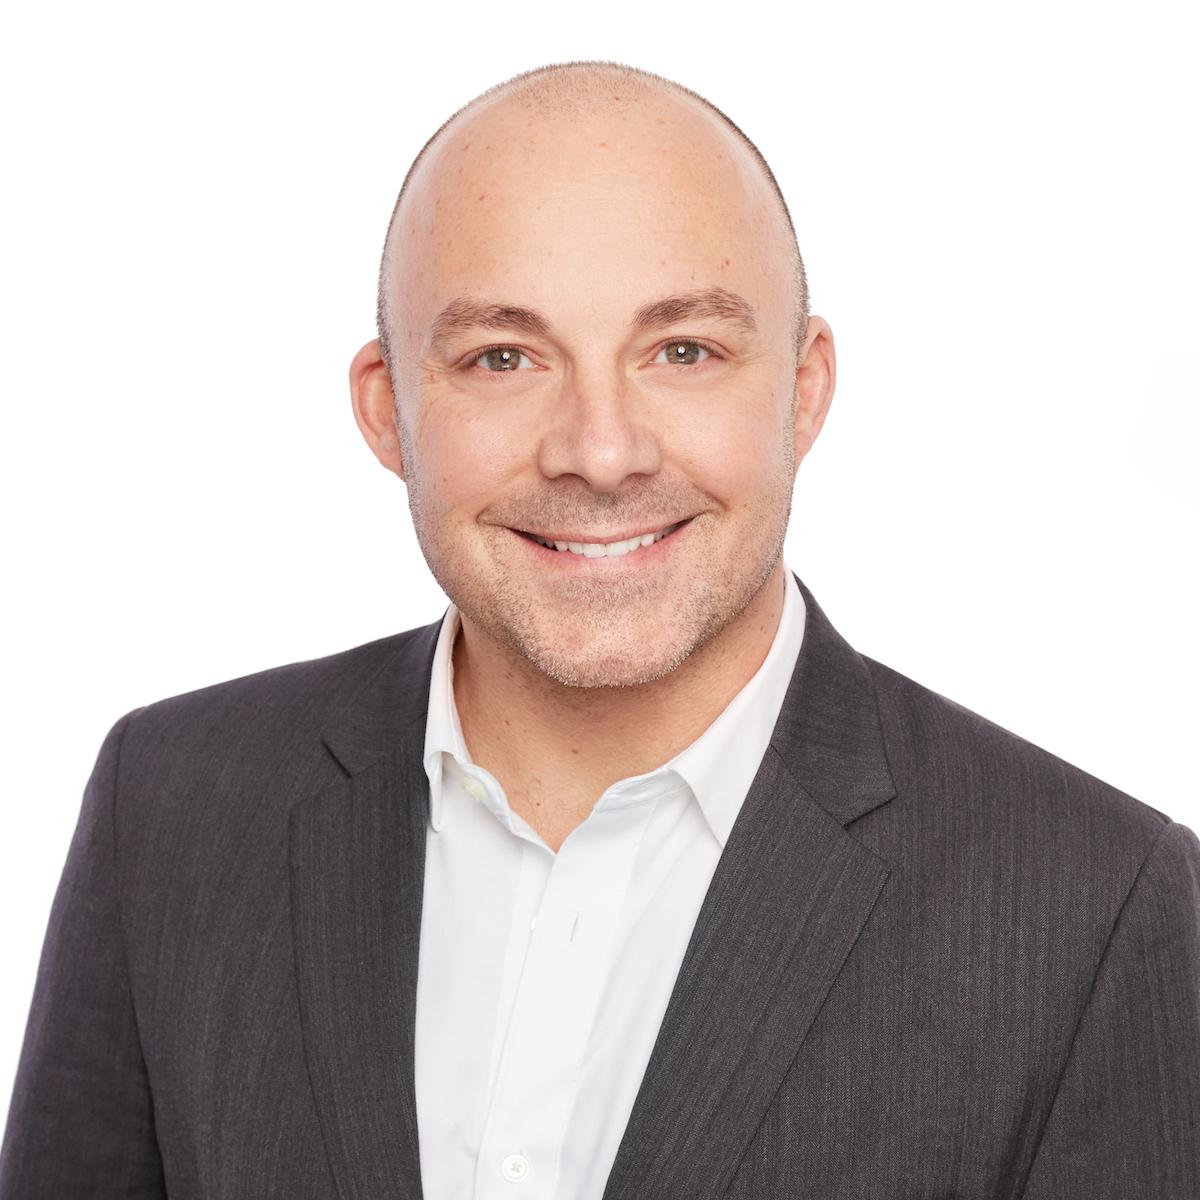 Jayson Krause, Managing Director